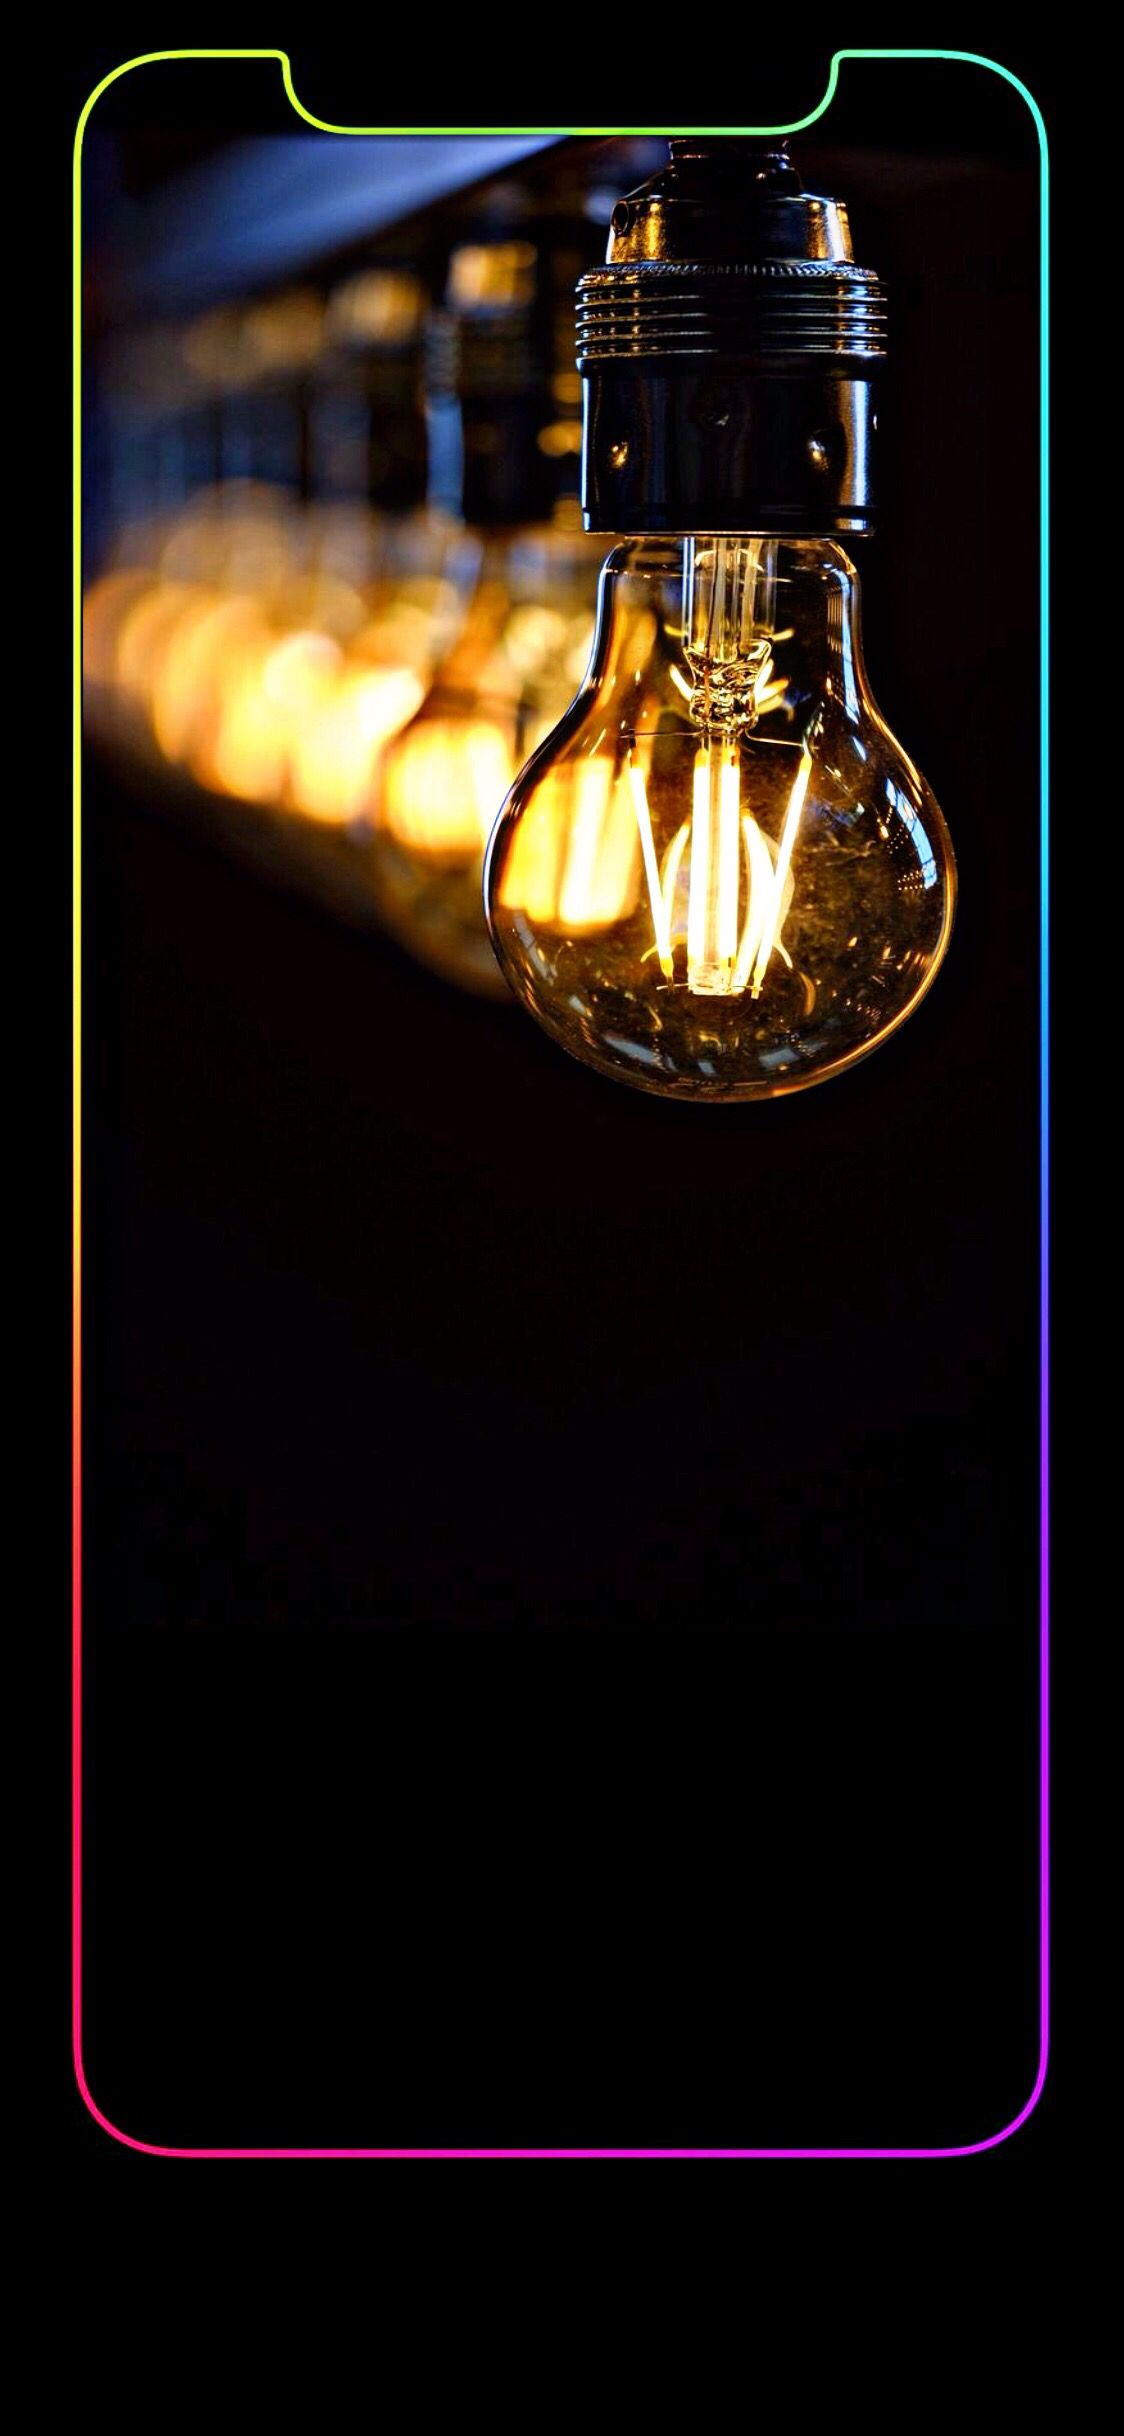 iPhoneX LightBulb iphonexwallpapers   Apple wallpaper iphone ...